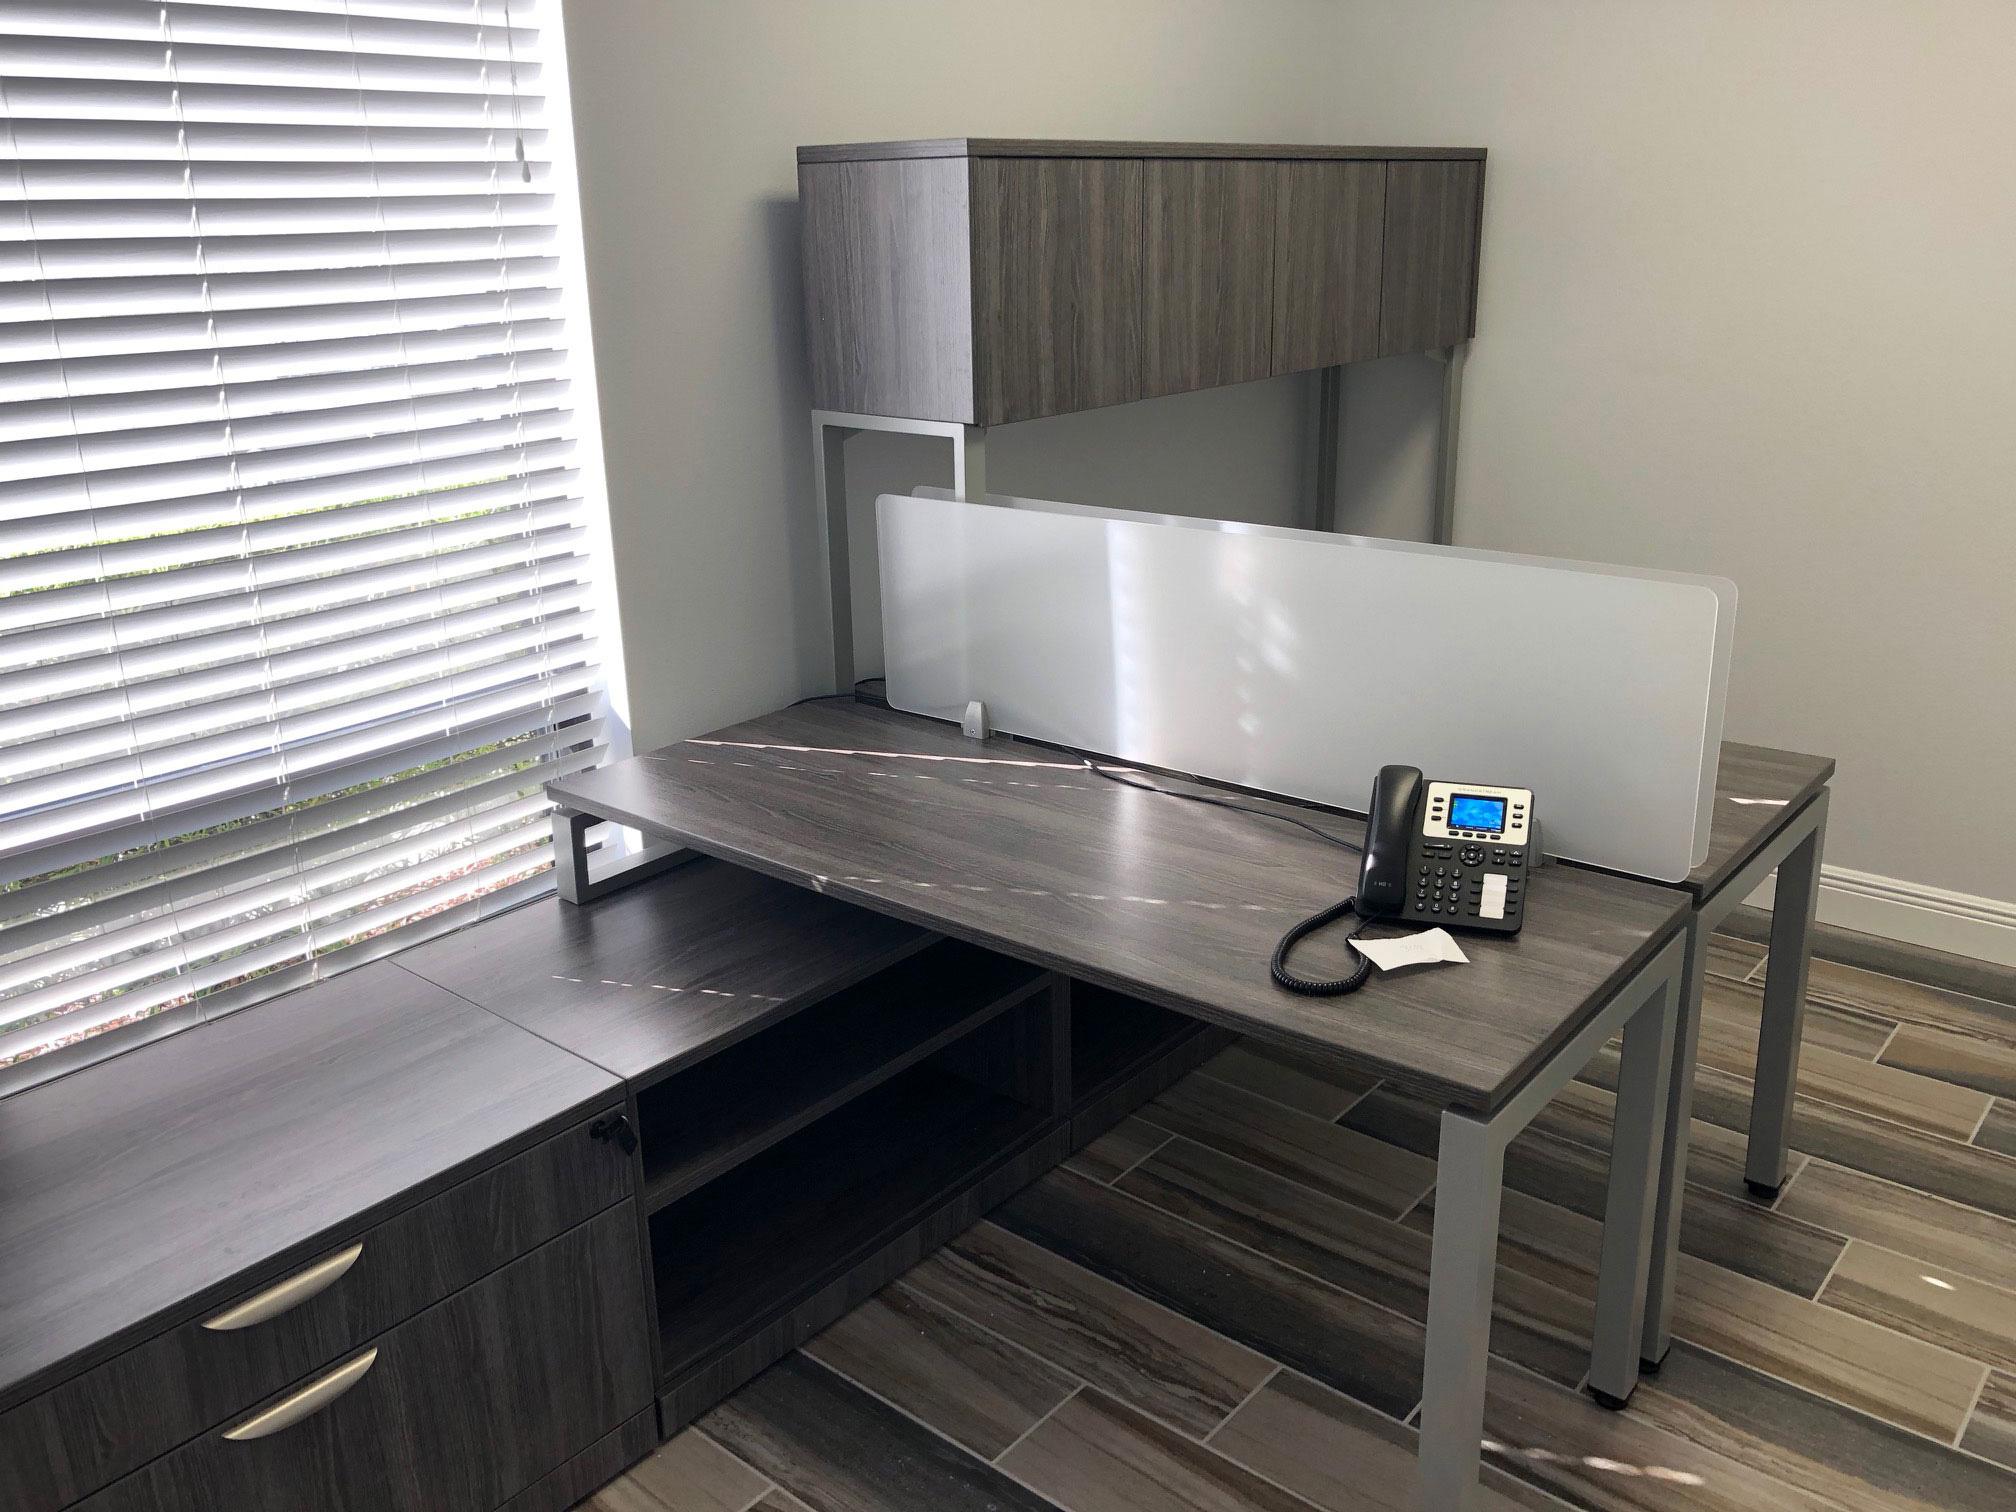 furniture-cubicles-in-st.-petersburg-florida-6.jpg